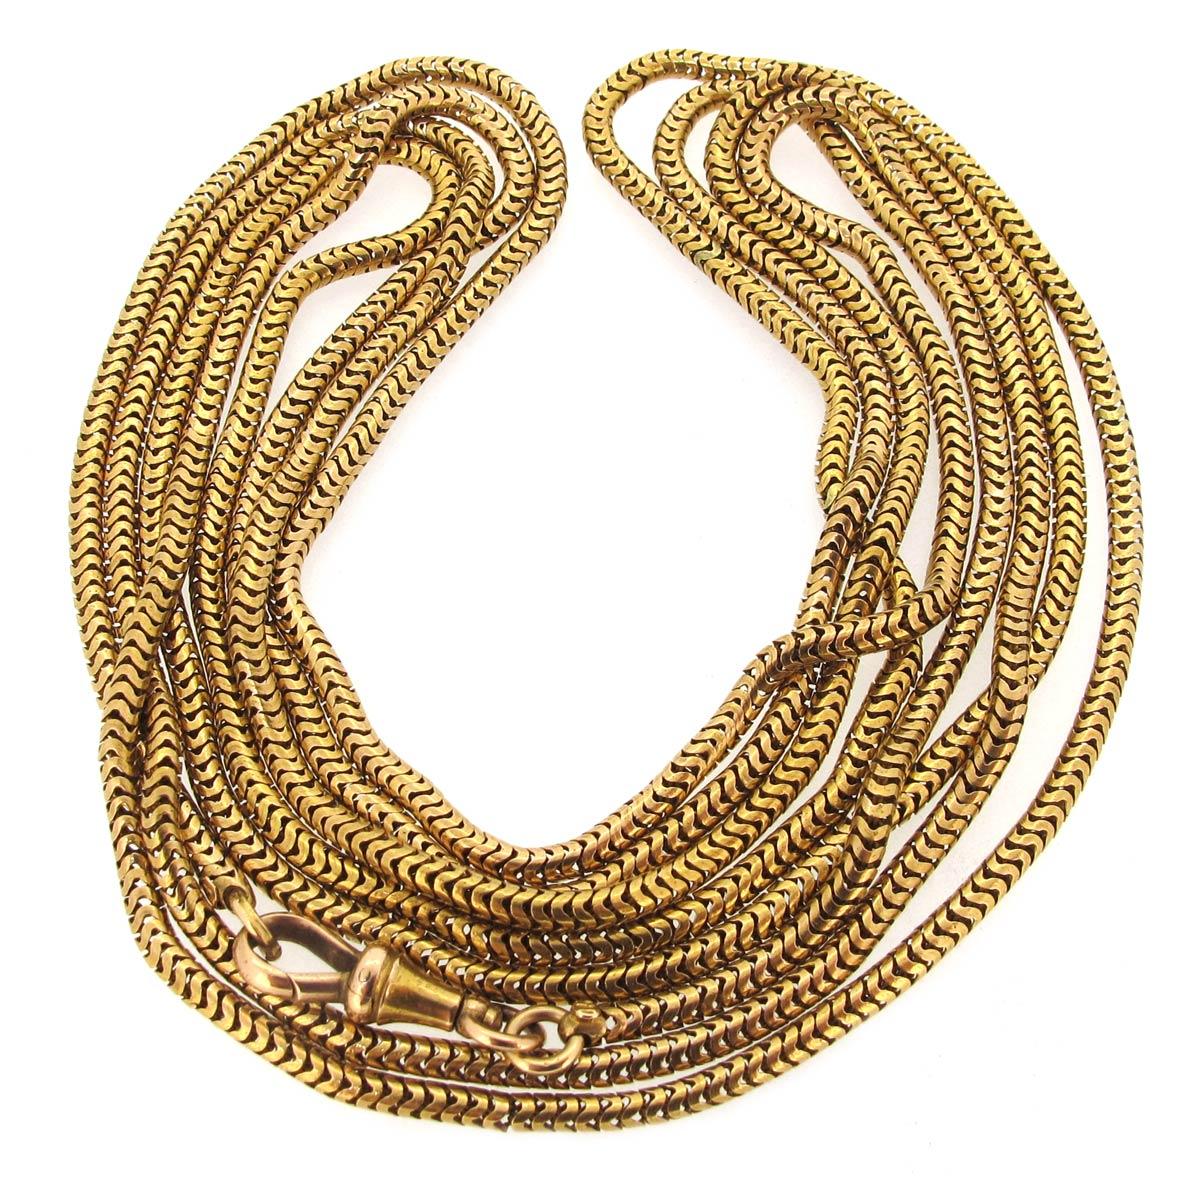 Antique Gold Guard Chain